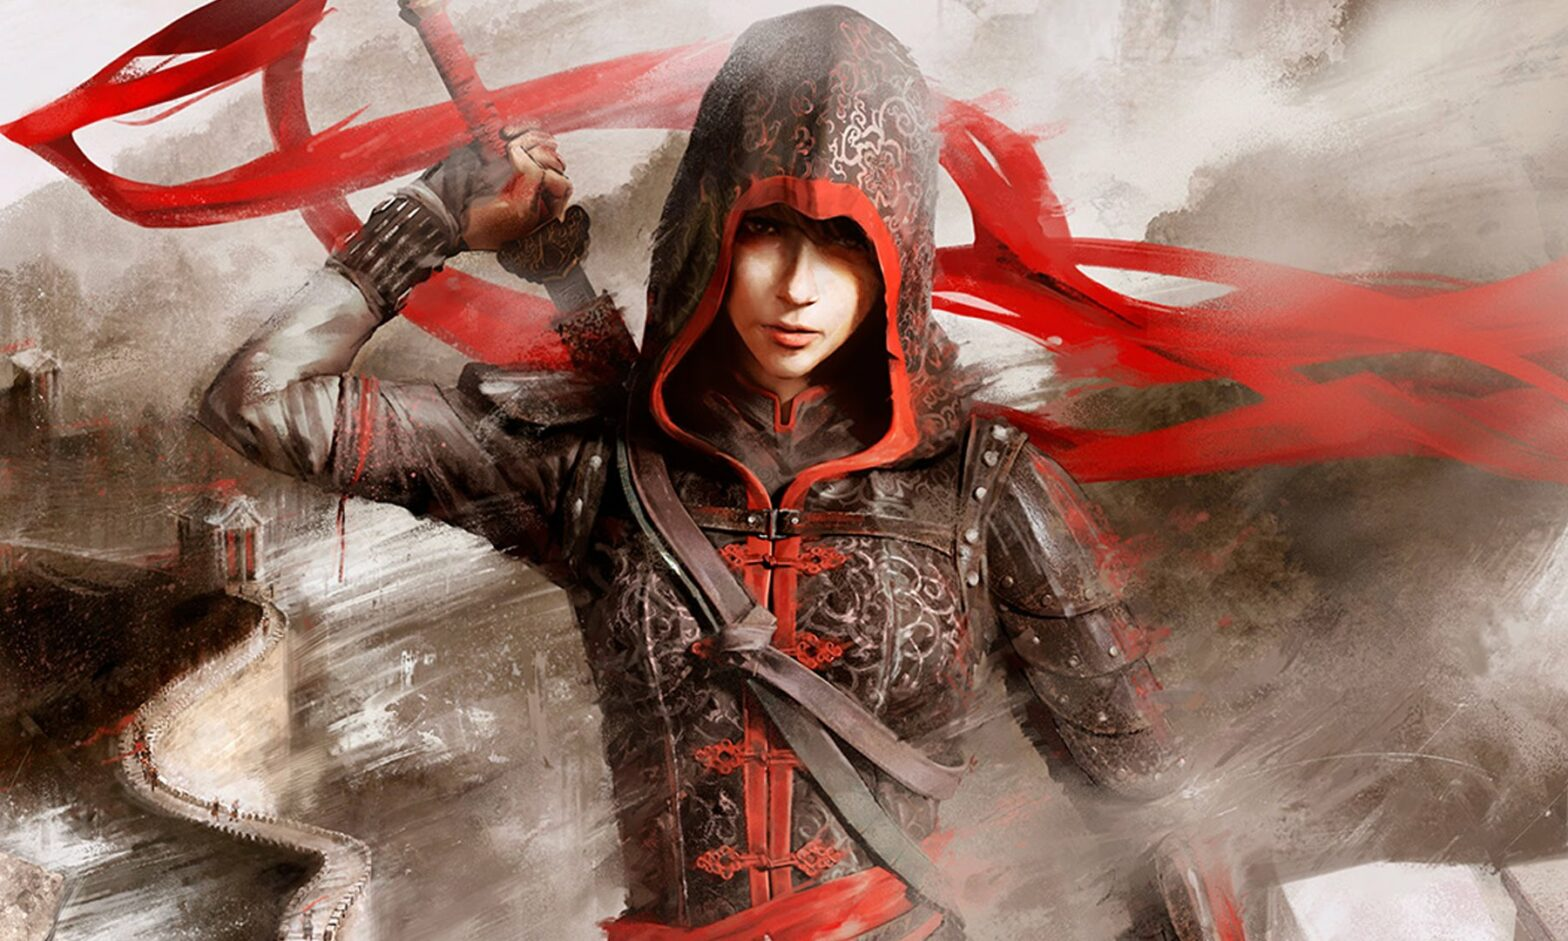 Assassin's Creed Chronicles: China heute veröffentlicht – Launchtrailer